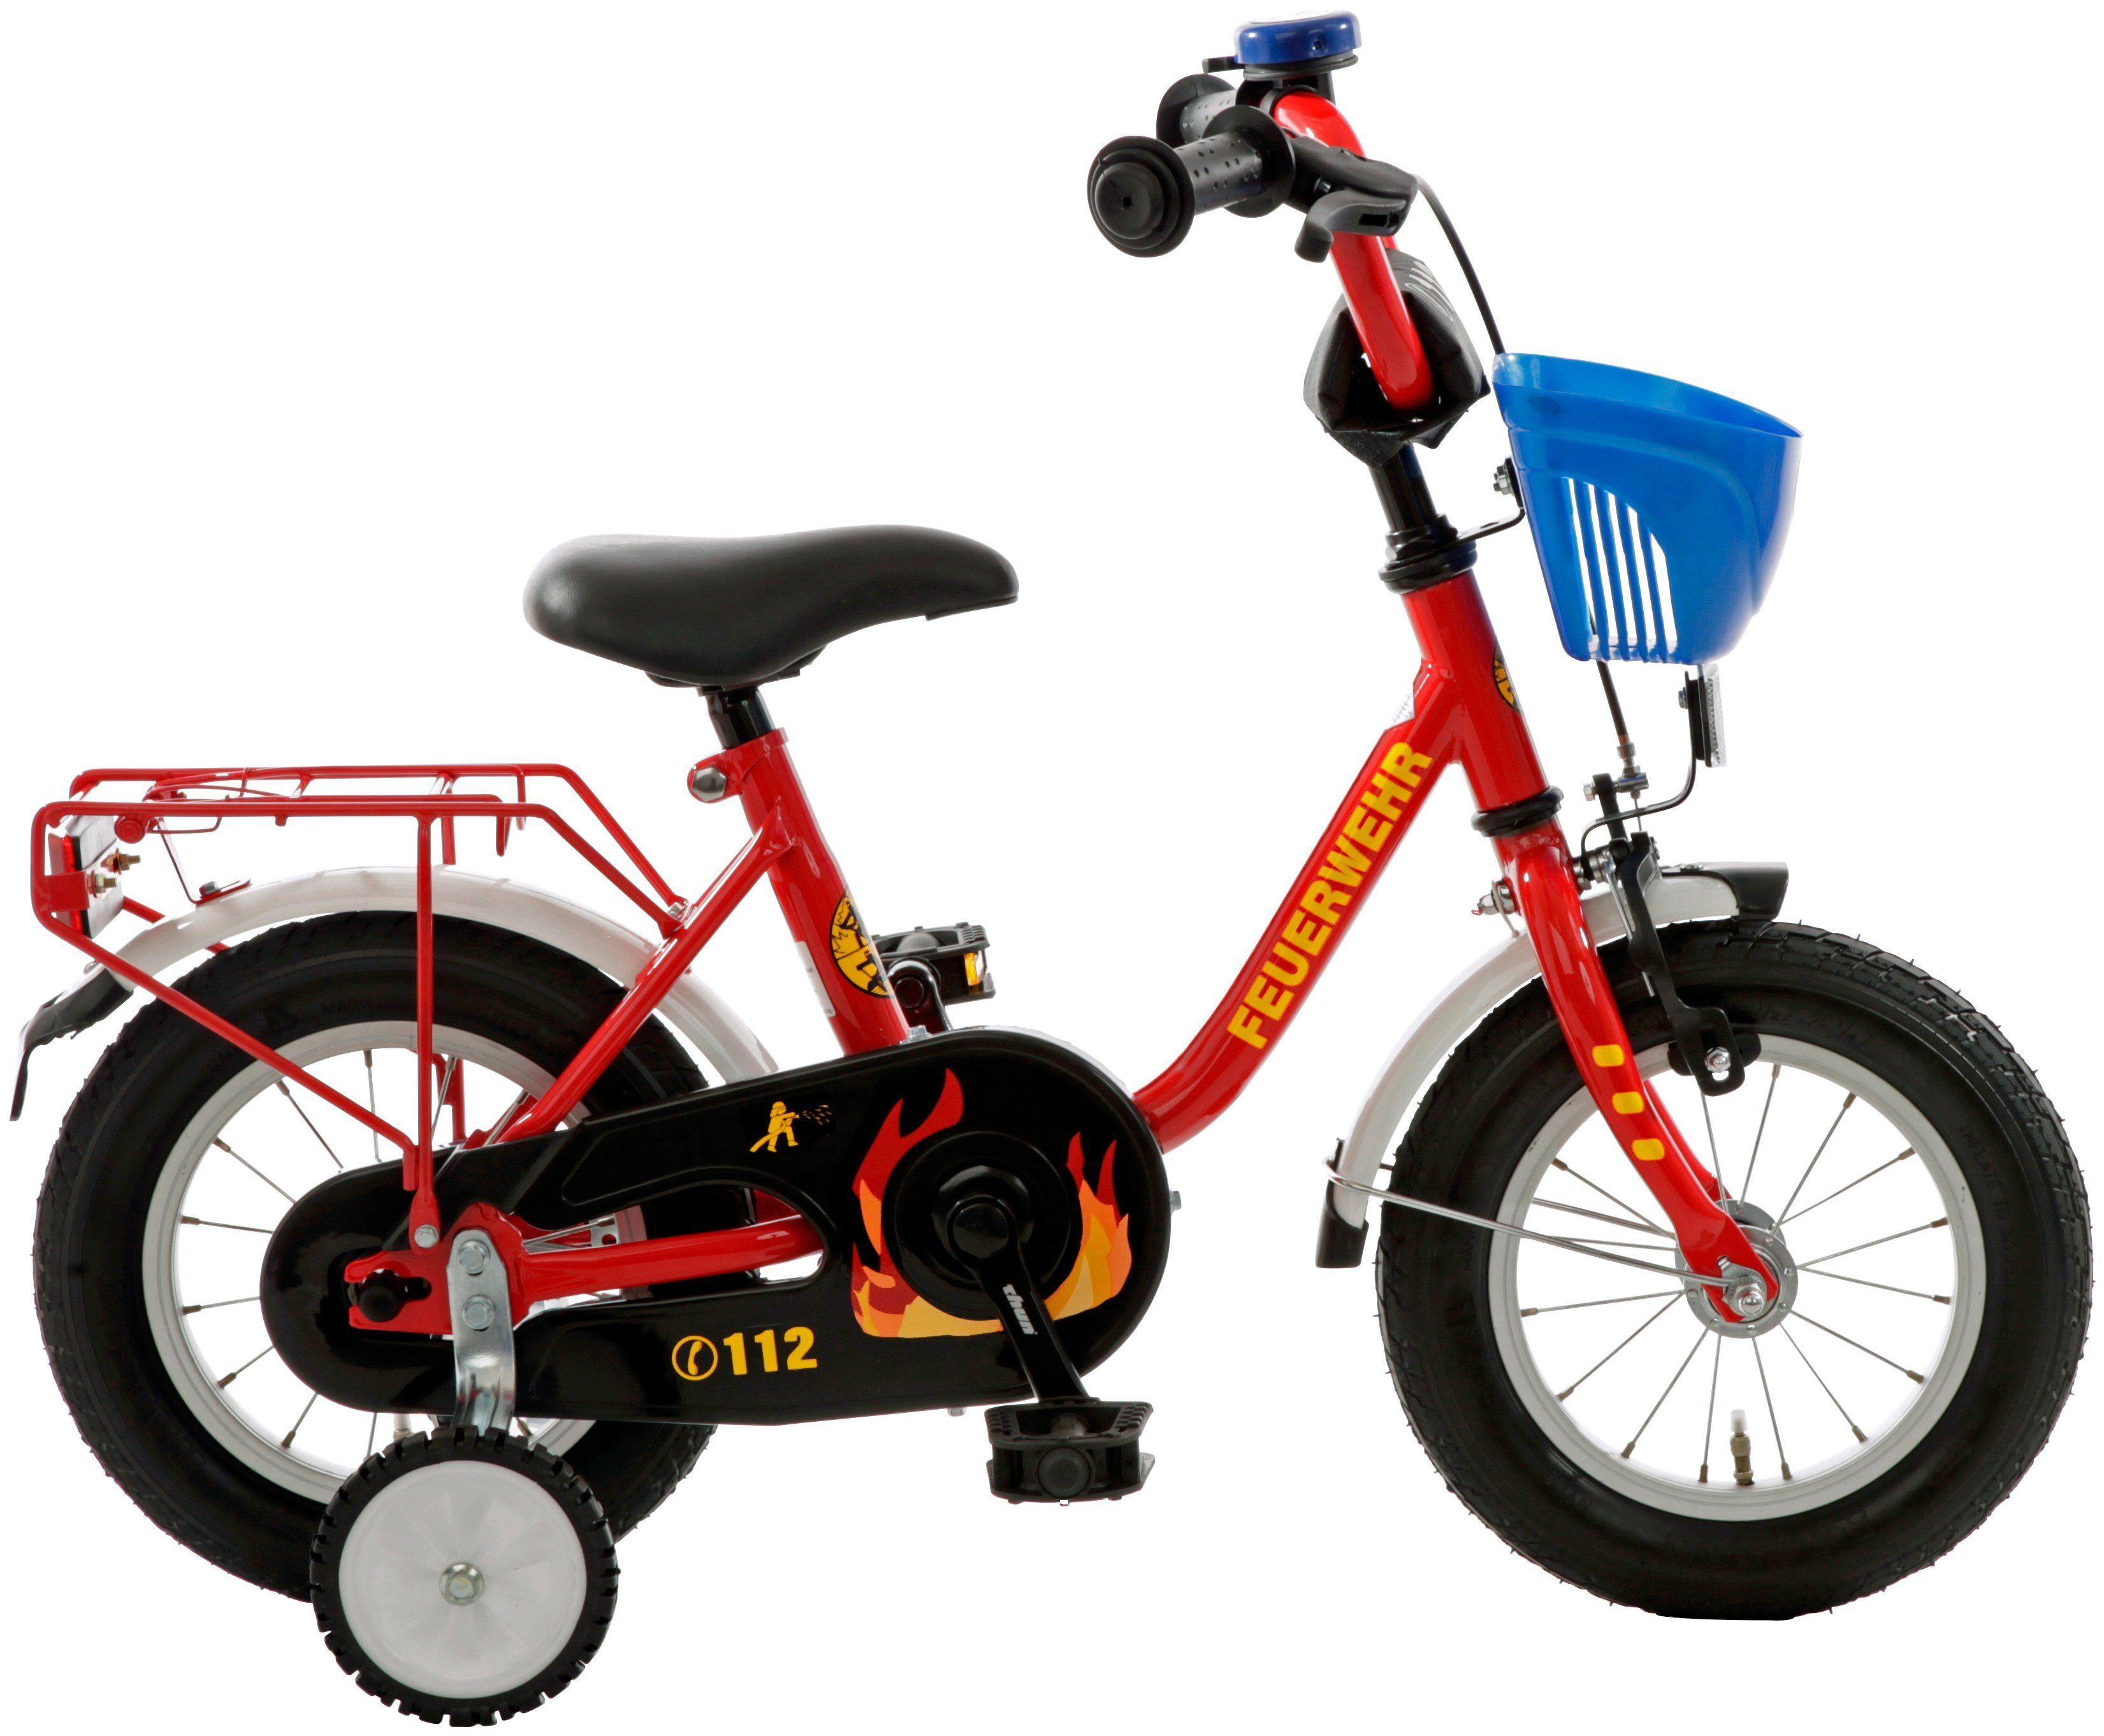 CYCLES4KIDS Kinderfahrrad »Feuerwehr «, 12,5 Zoll, 1 Gang, Rücktrittbremse